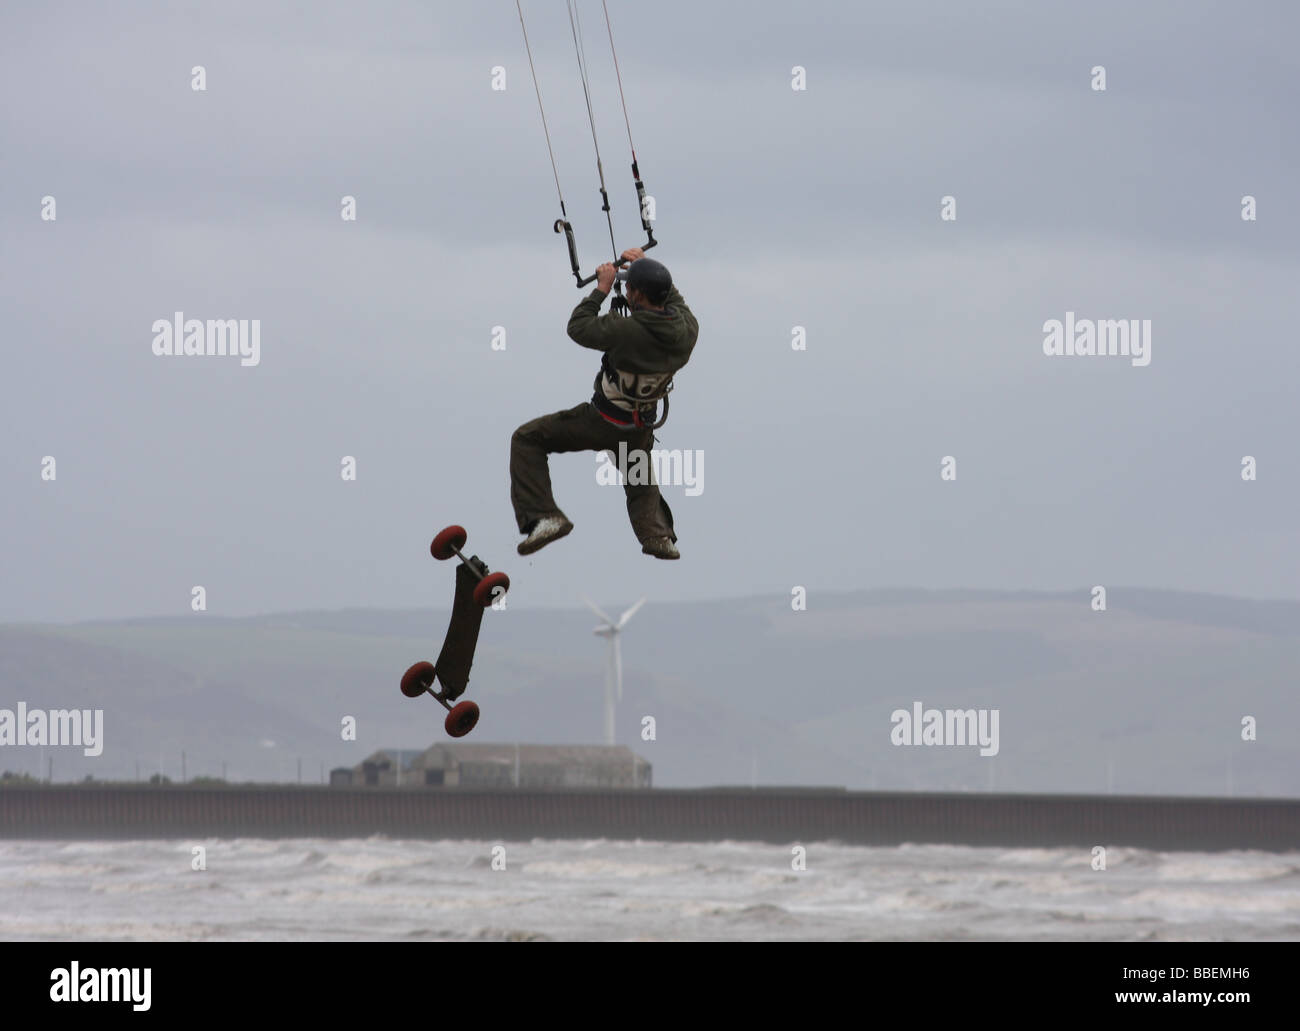 Kite landboarder loses his board. - Stock Image